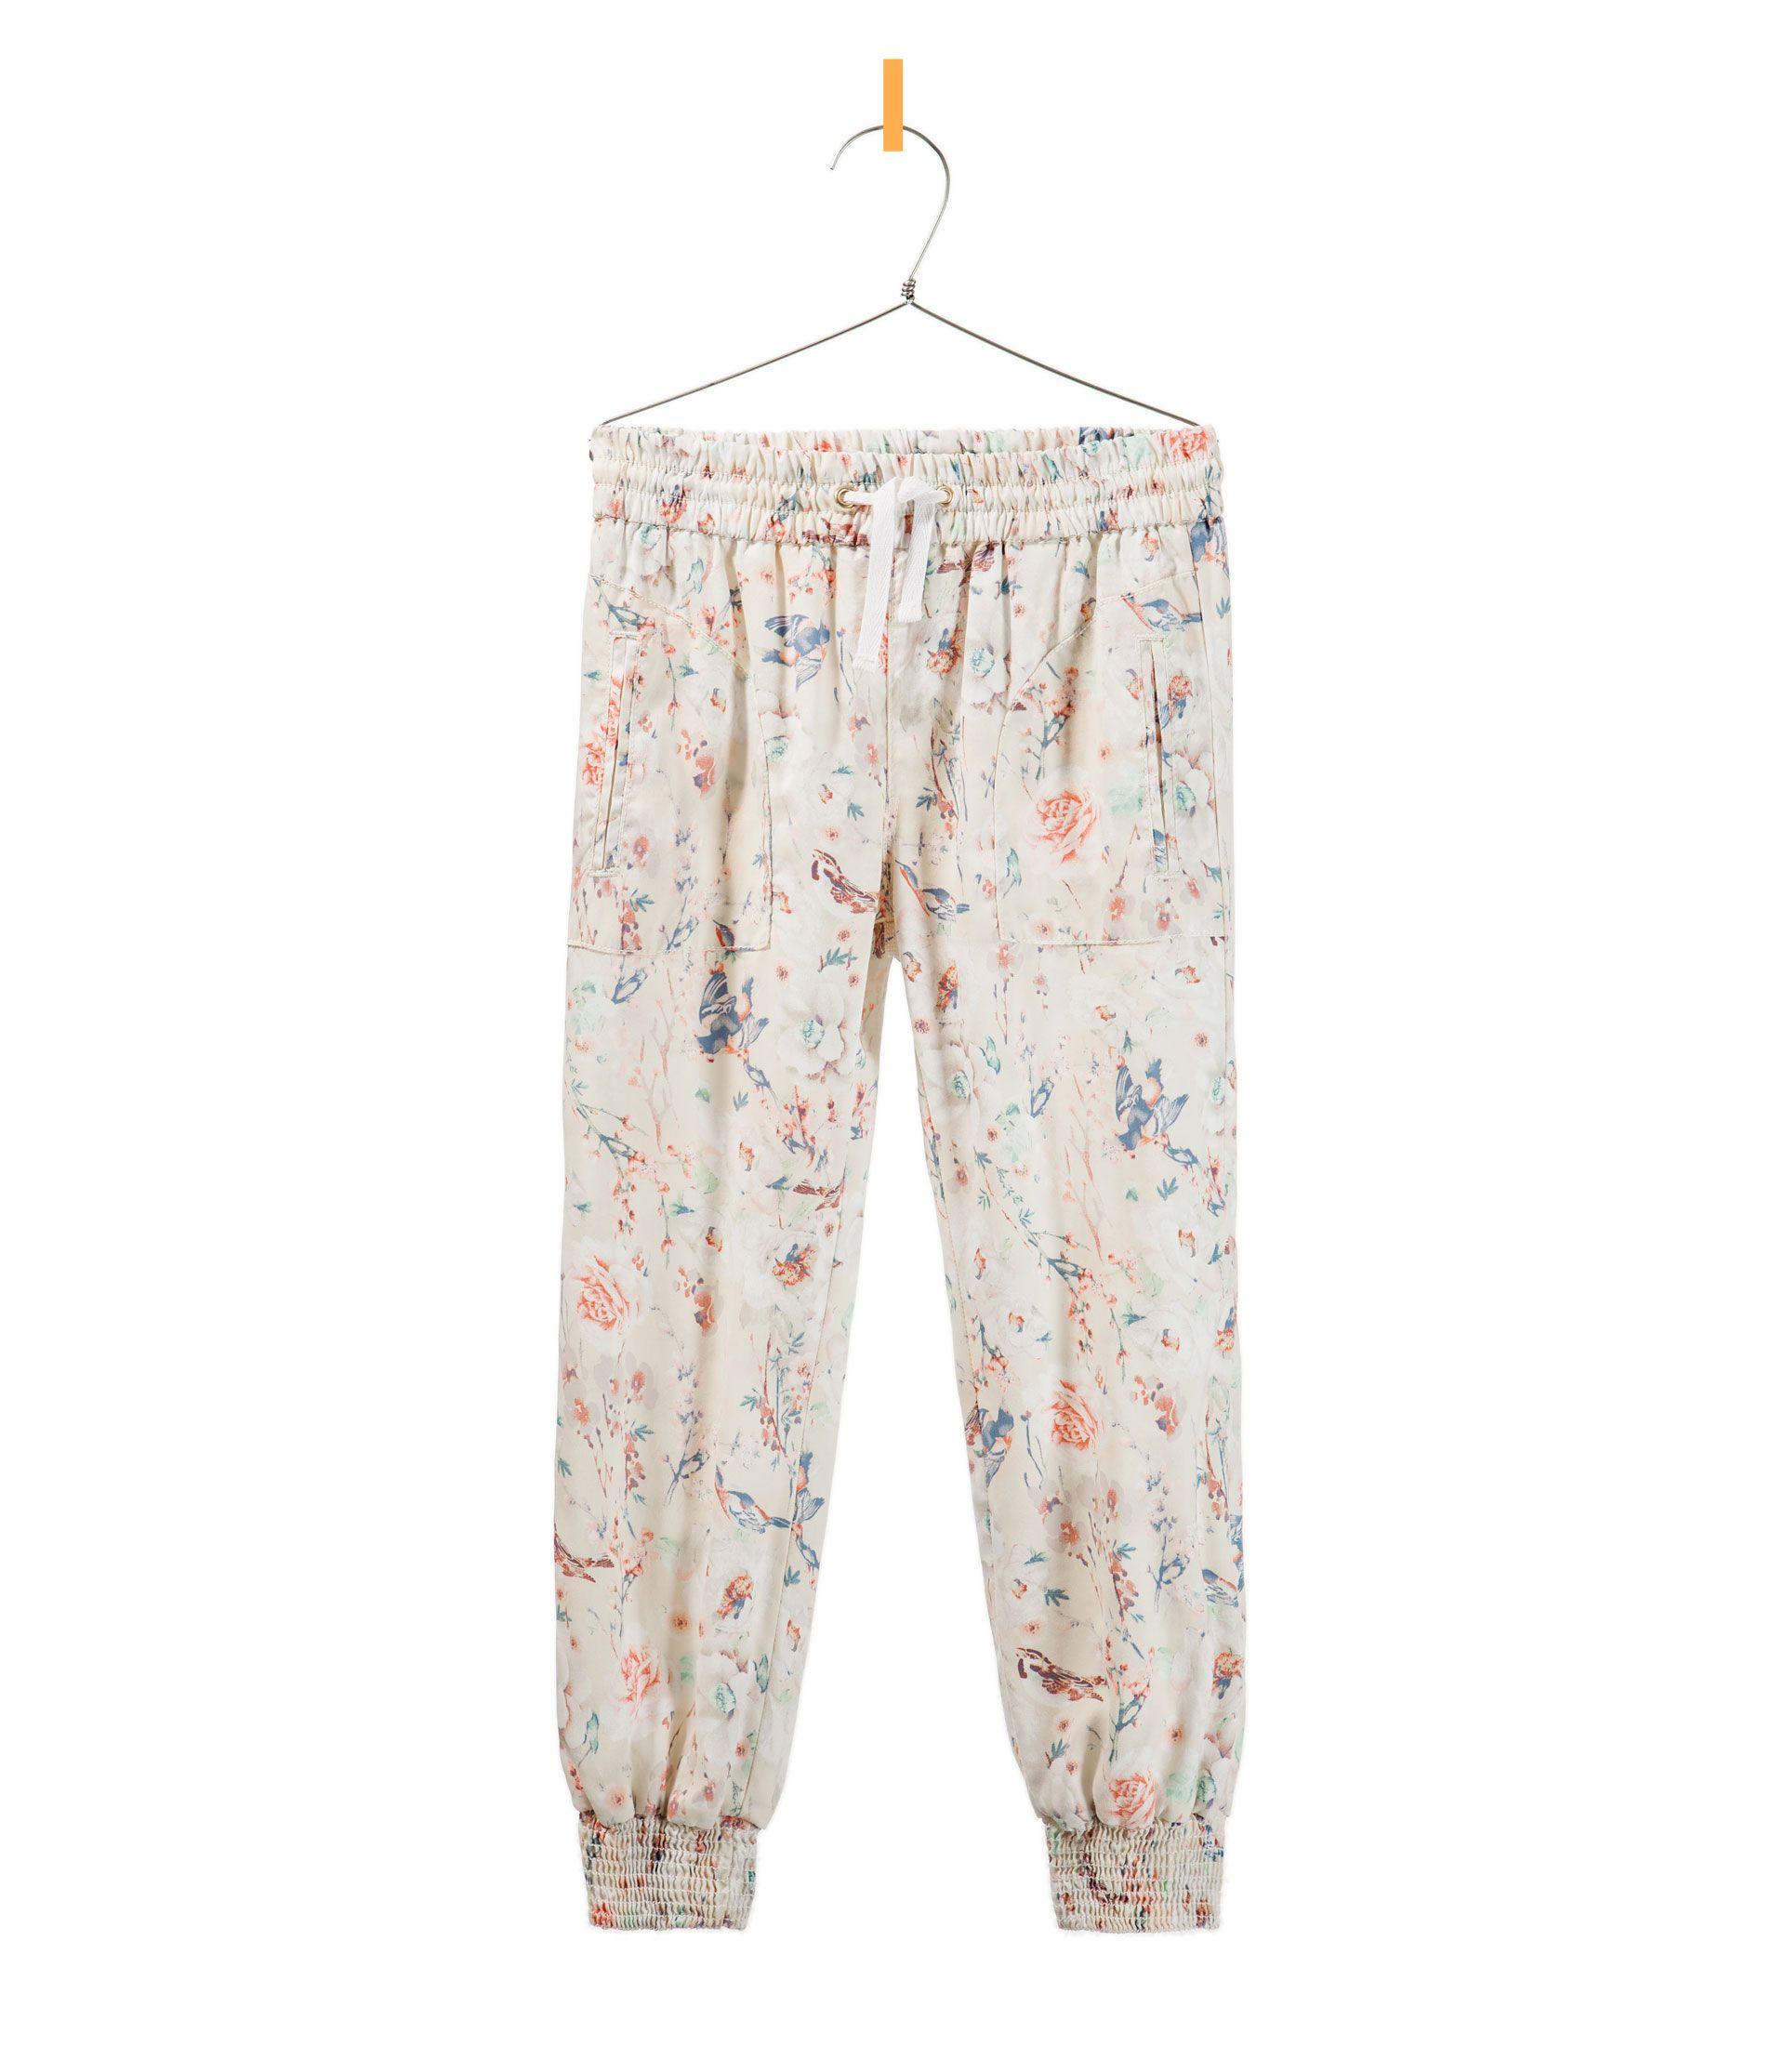 PRINTED TROUSERS WITH ELASTIC HEMS - Trousers - Girl - Kids - ZARA United Kingdom SS13